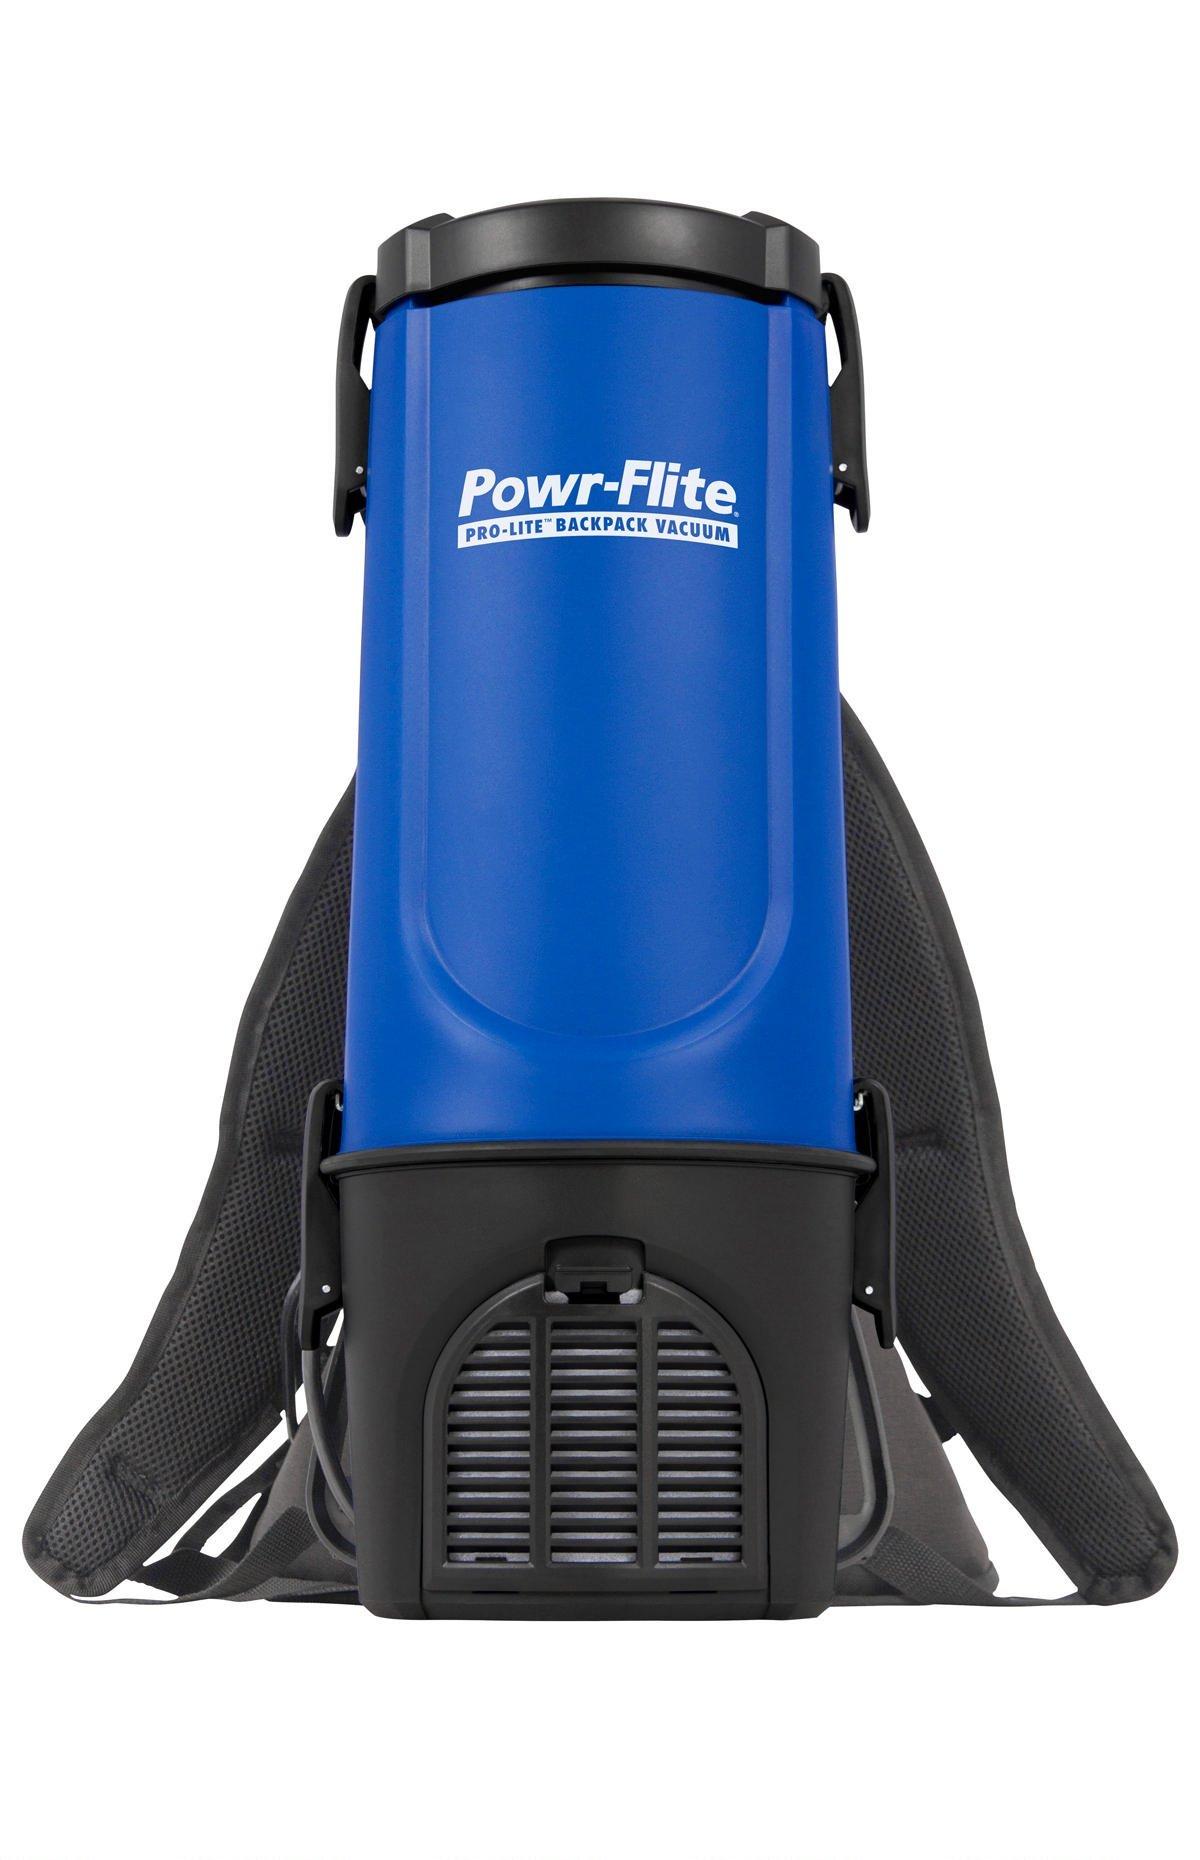 Powr-Flite BP4S Pro-Lite Backpack Vacuum, 22.5'' Height, 9.5'' Length